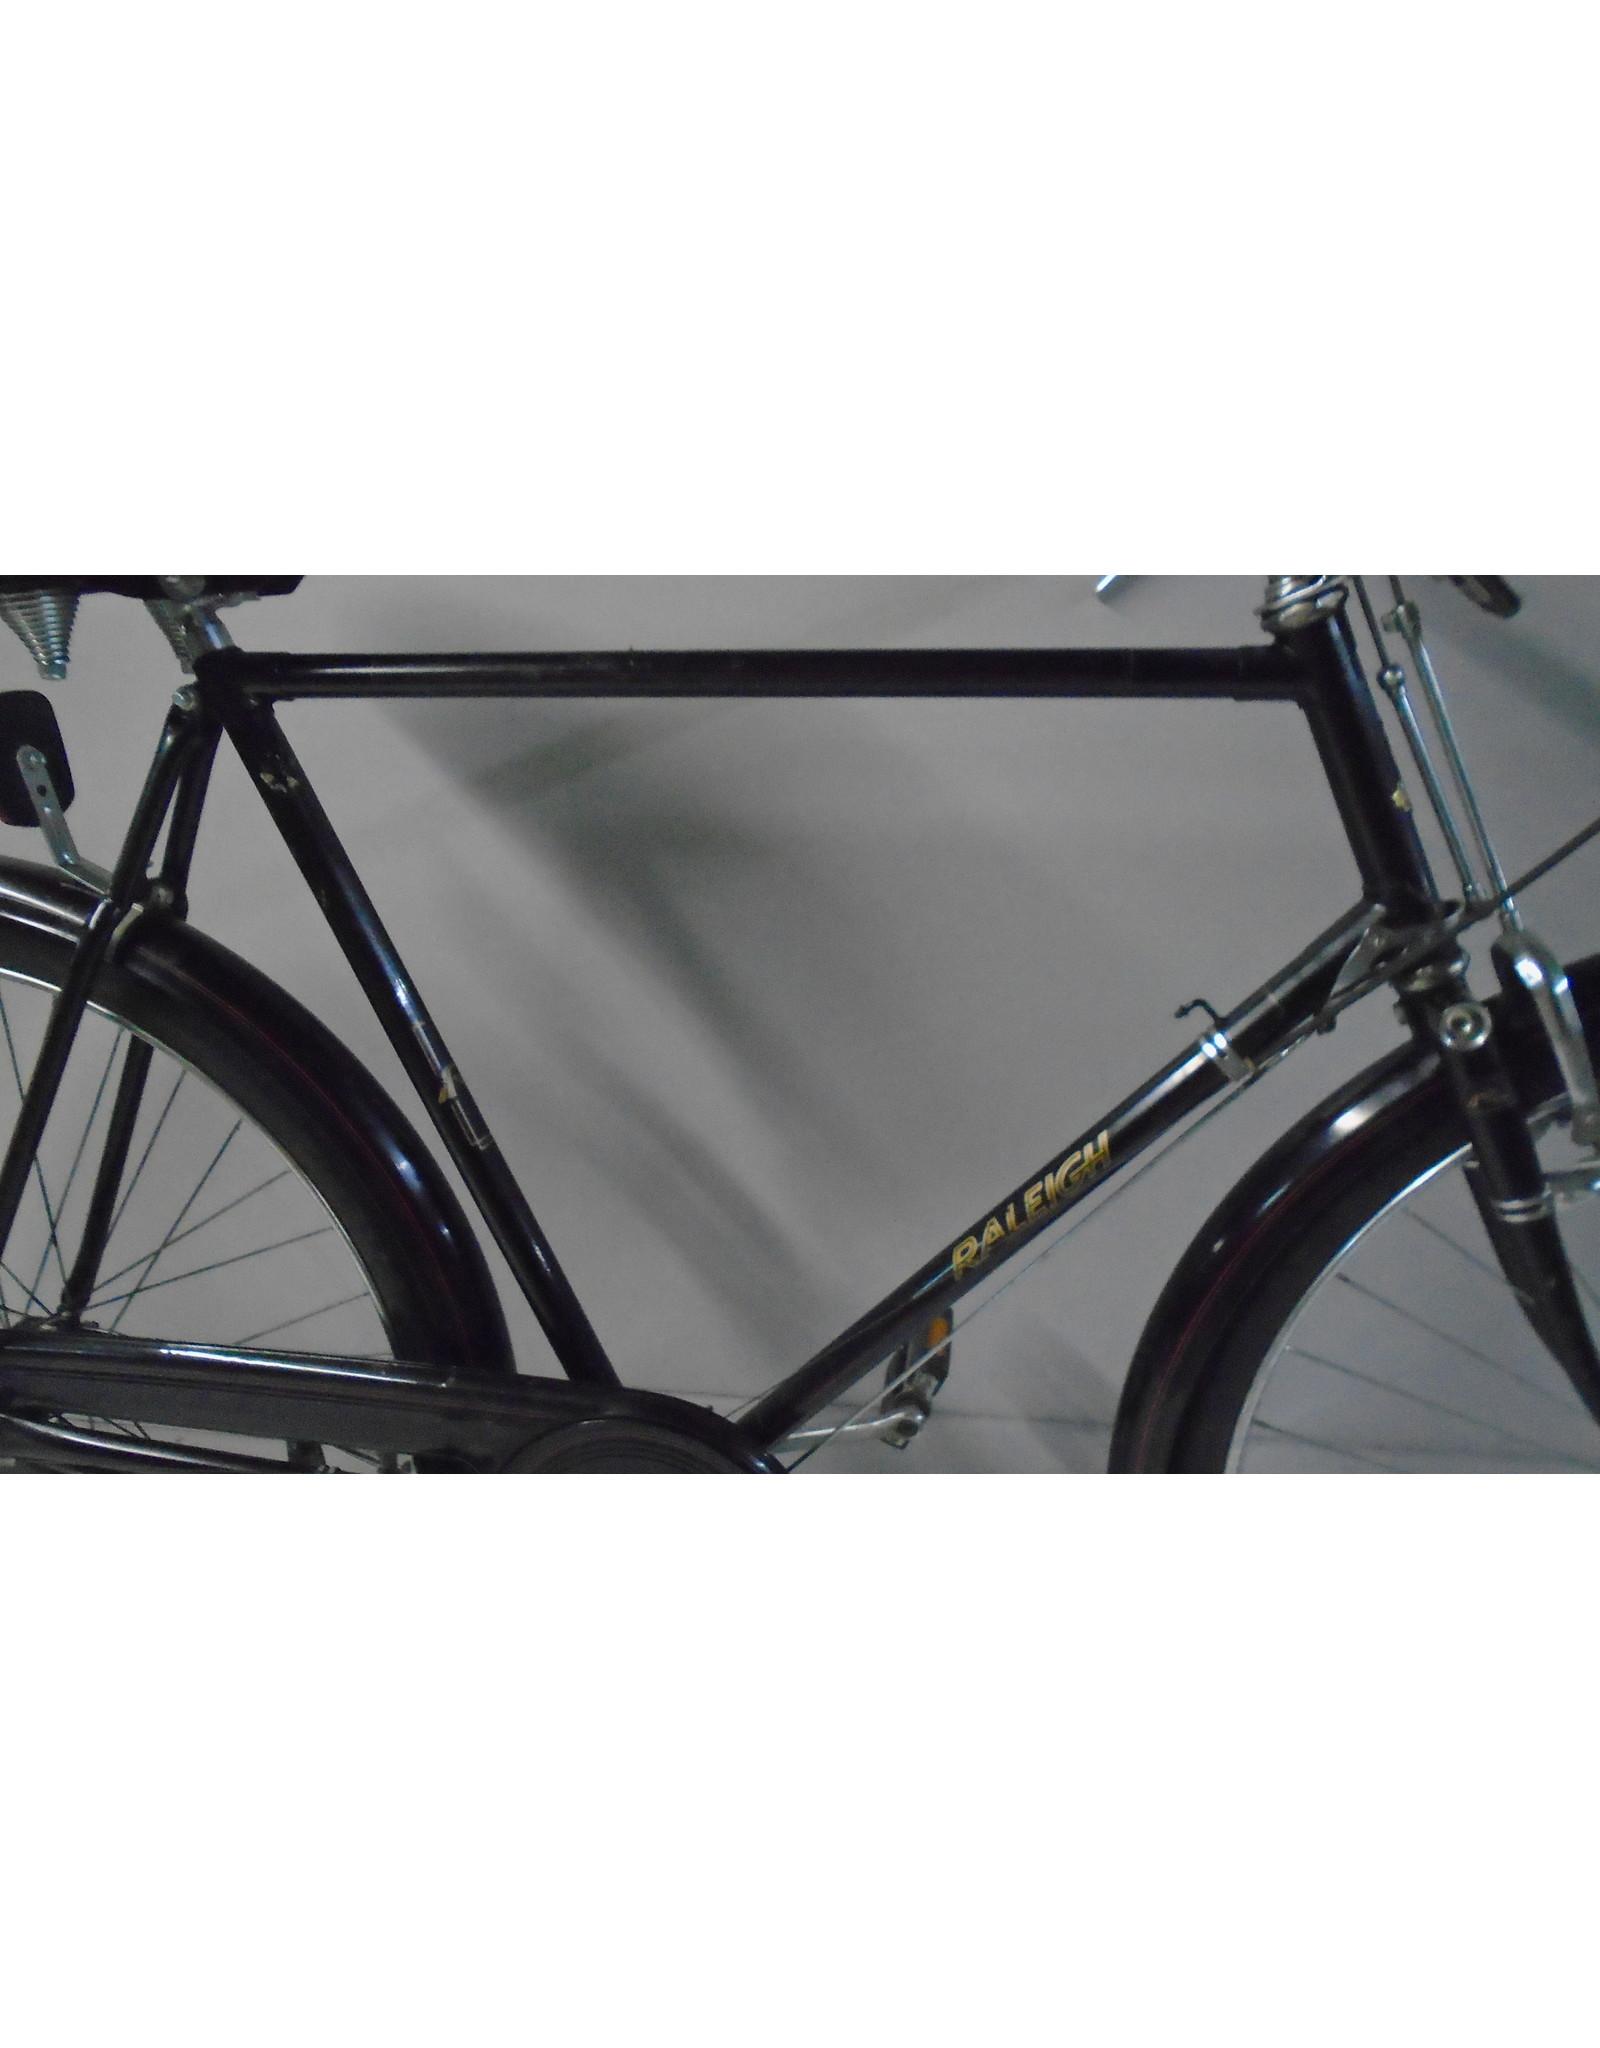 Vélo usagé antique Raleigh